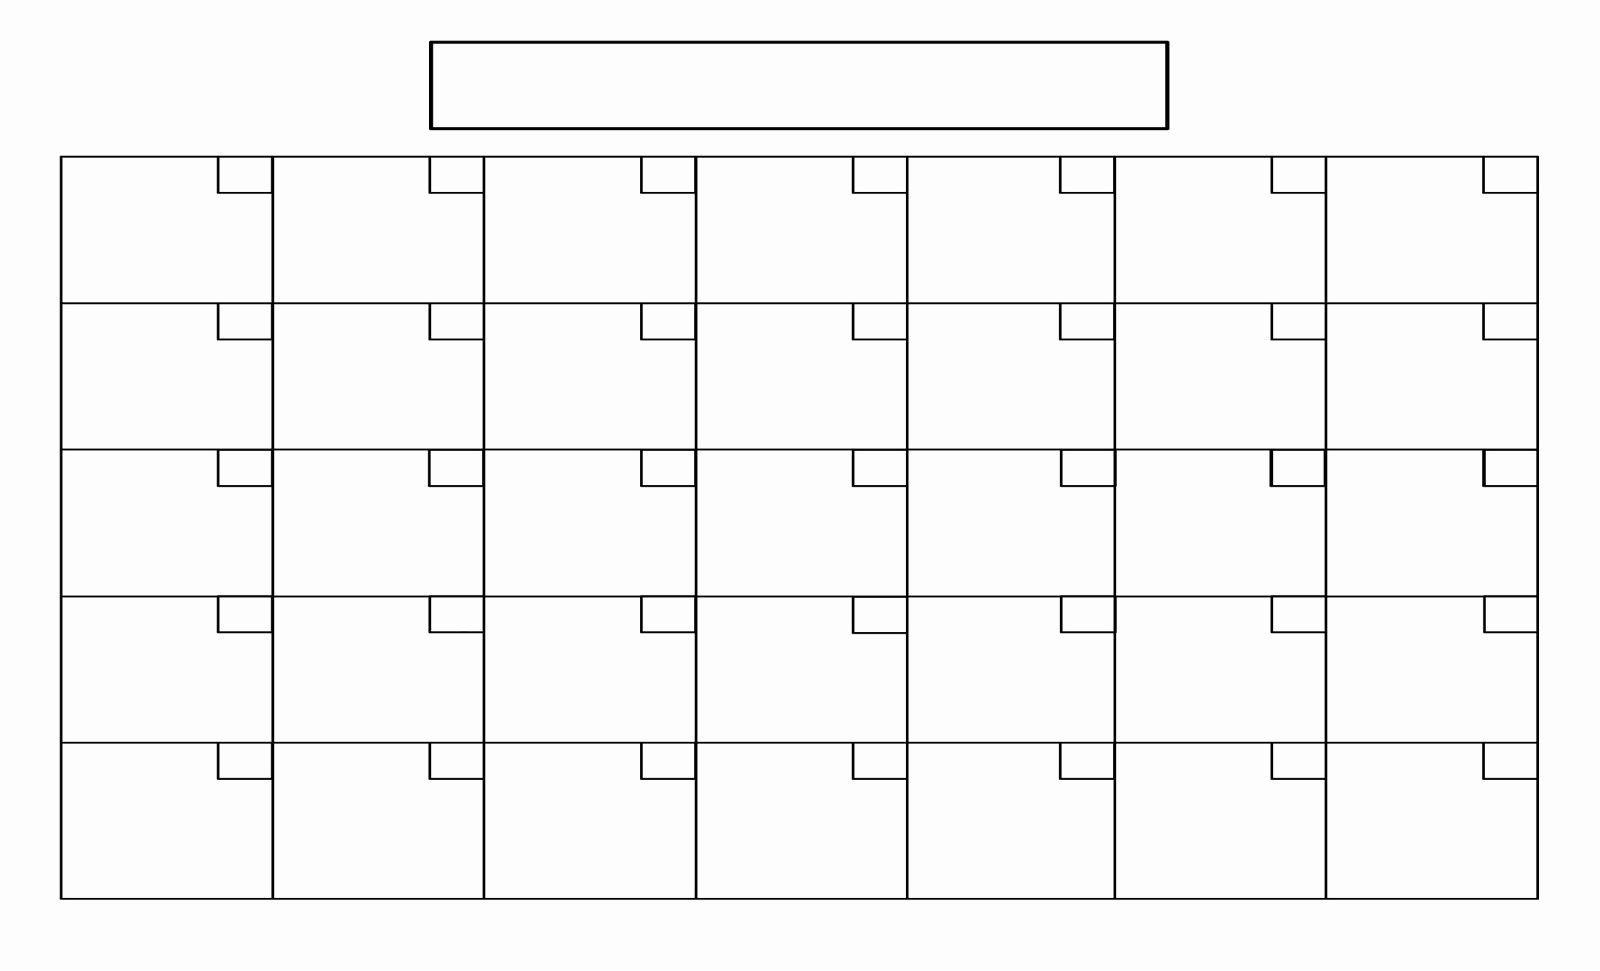 Printable Calendar Legal Size In 2020 | Blank Calendar Pages  Full Size Printable Monthly Calendars